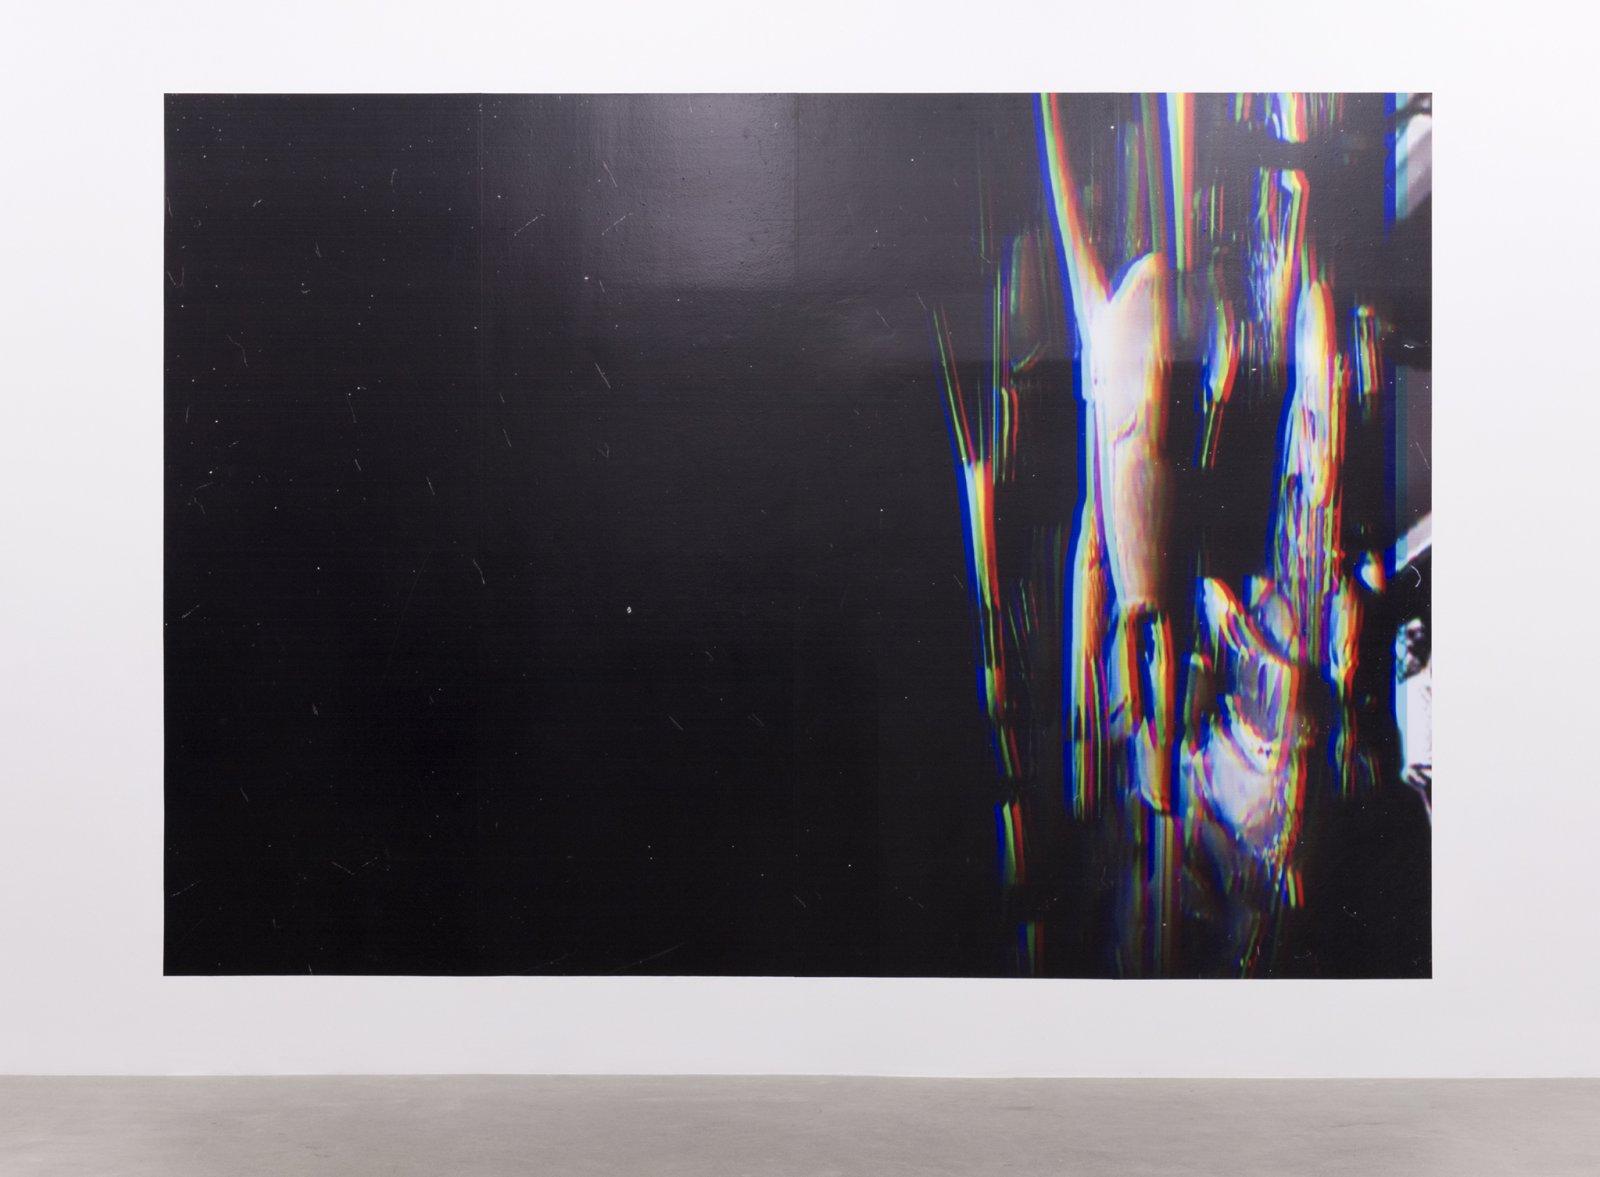 Raymond Boisjoly, Subsequent Categorizations (Institutional Framings), 2015, solvent-based inkjet print on vinyl, 114 x 165 in. (290 x 418 cm) by Raymond Boisjoly